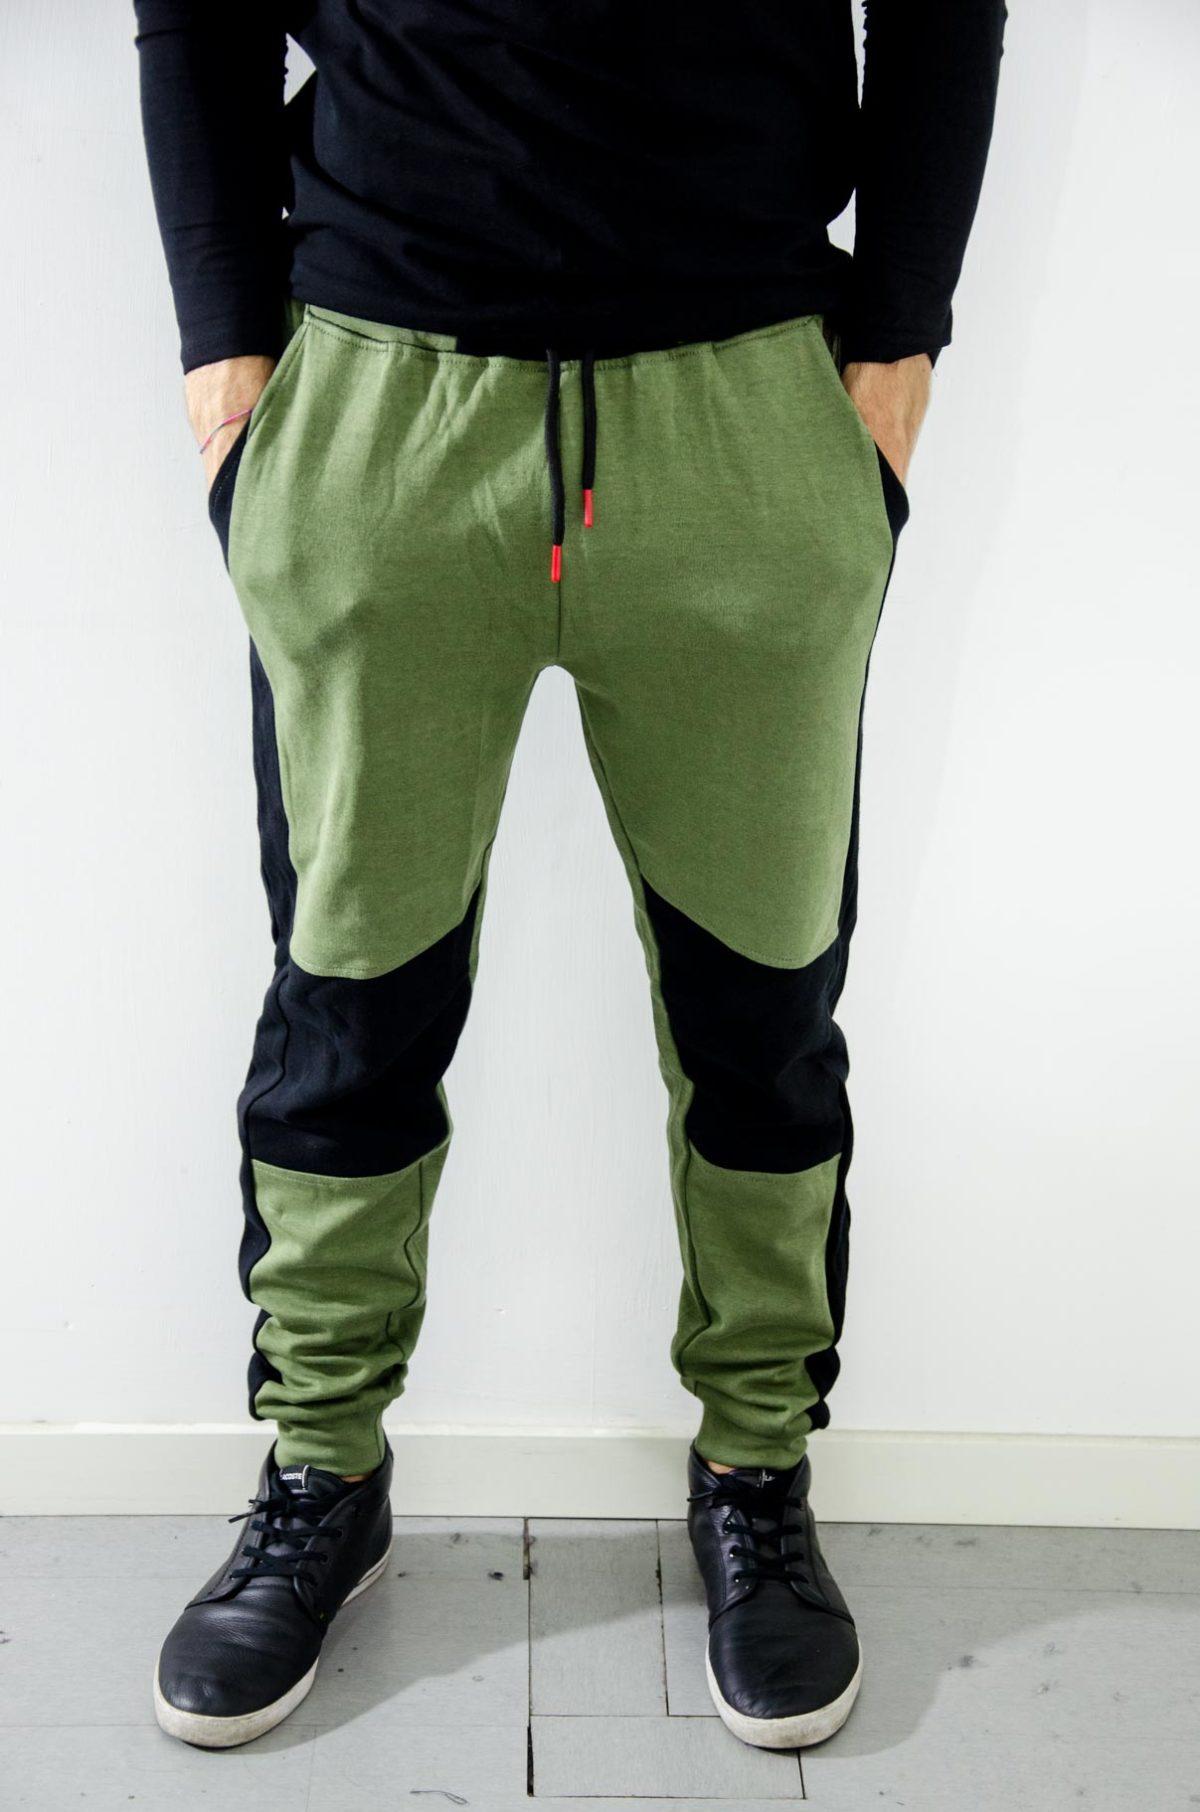 guess pantalone tuta uomo verde-nero